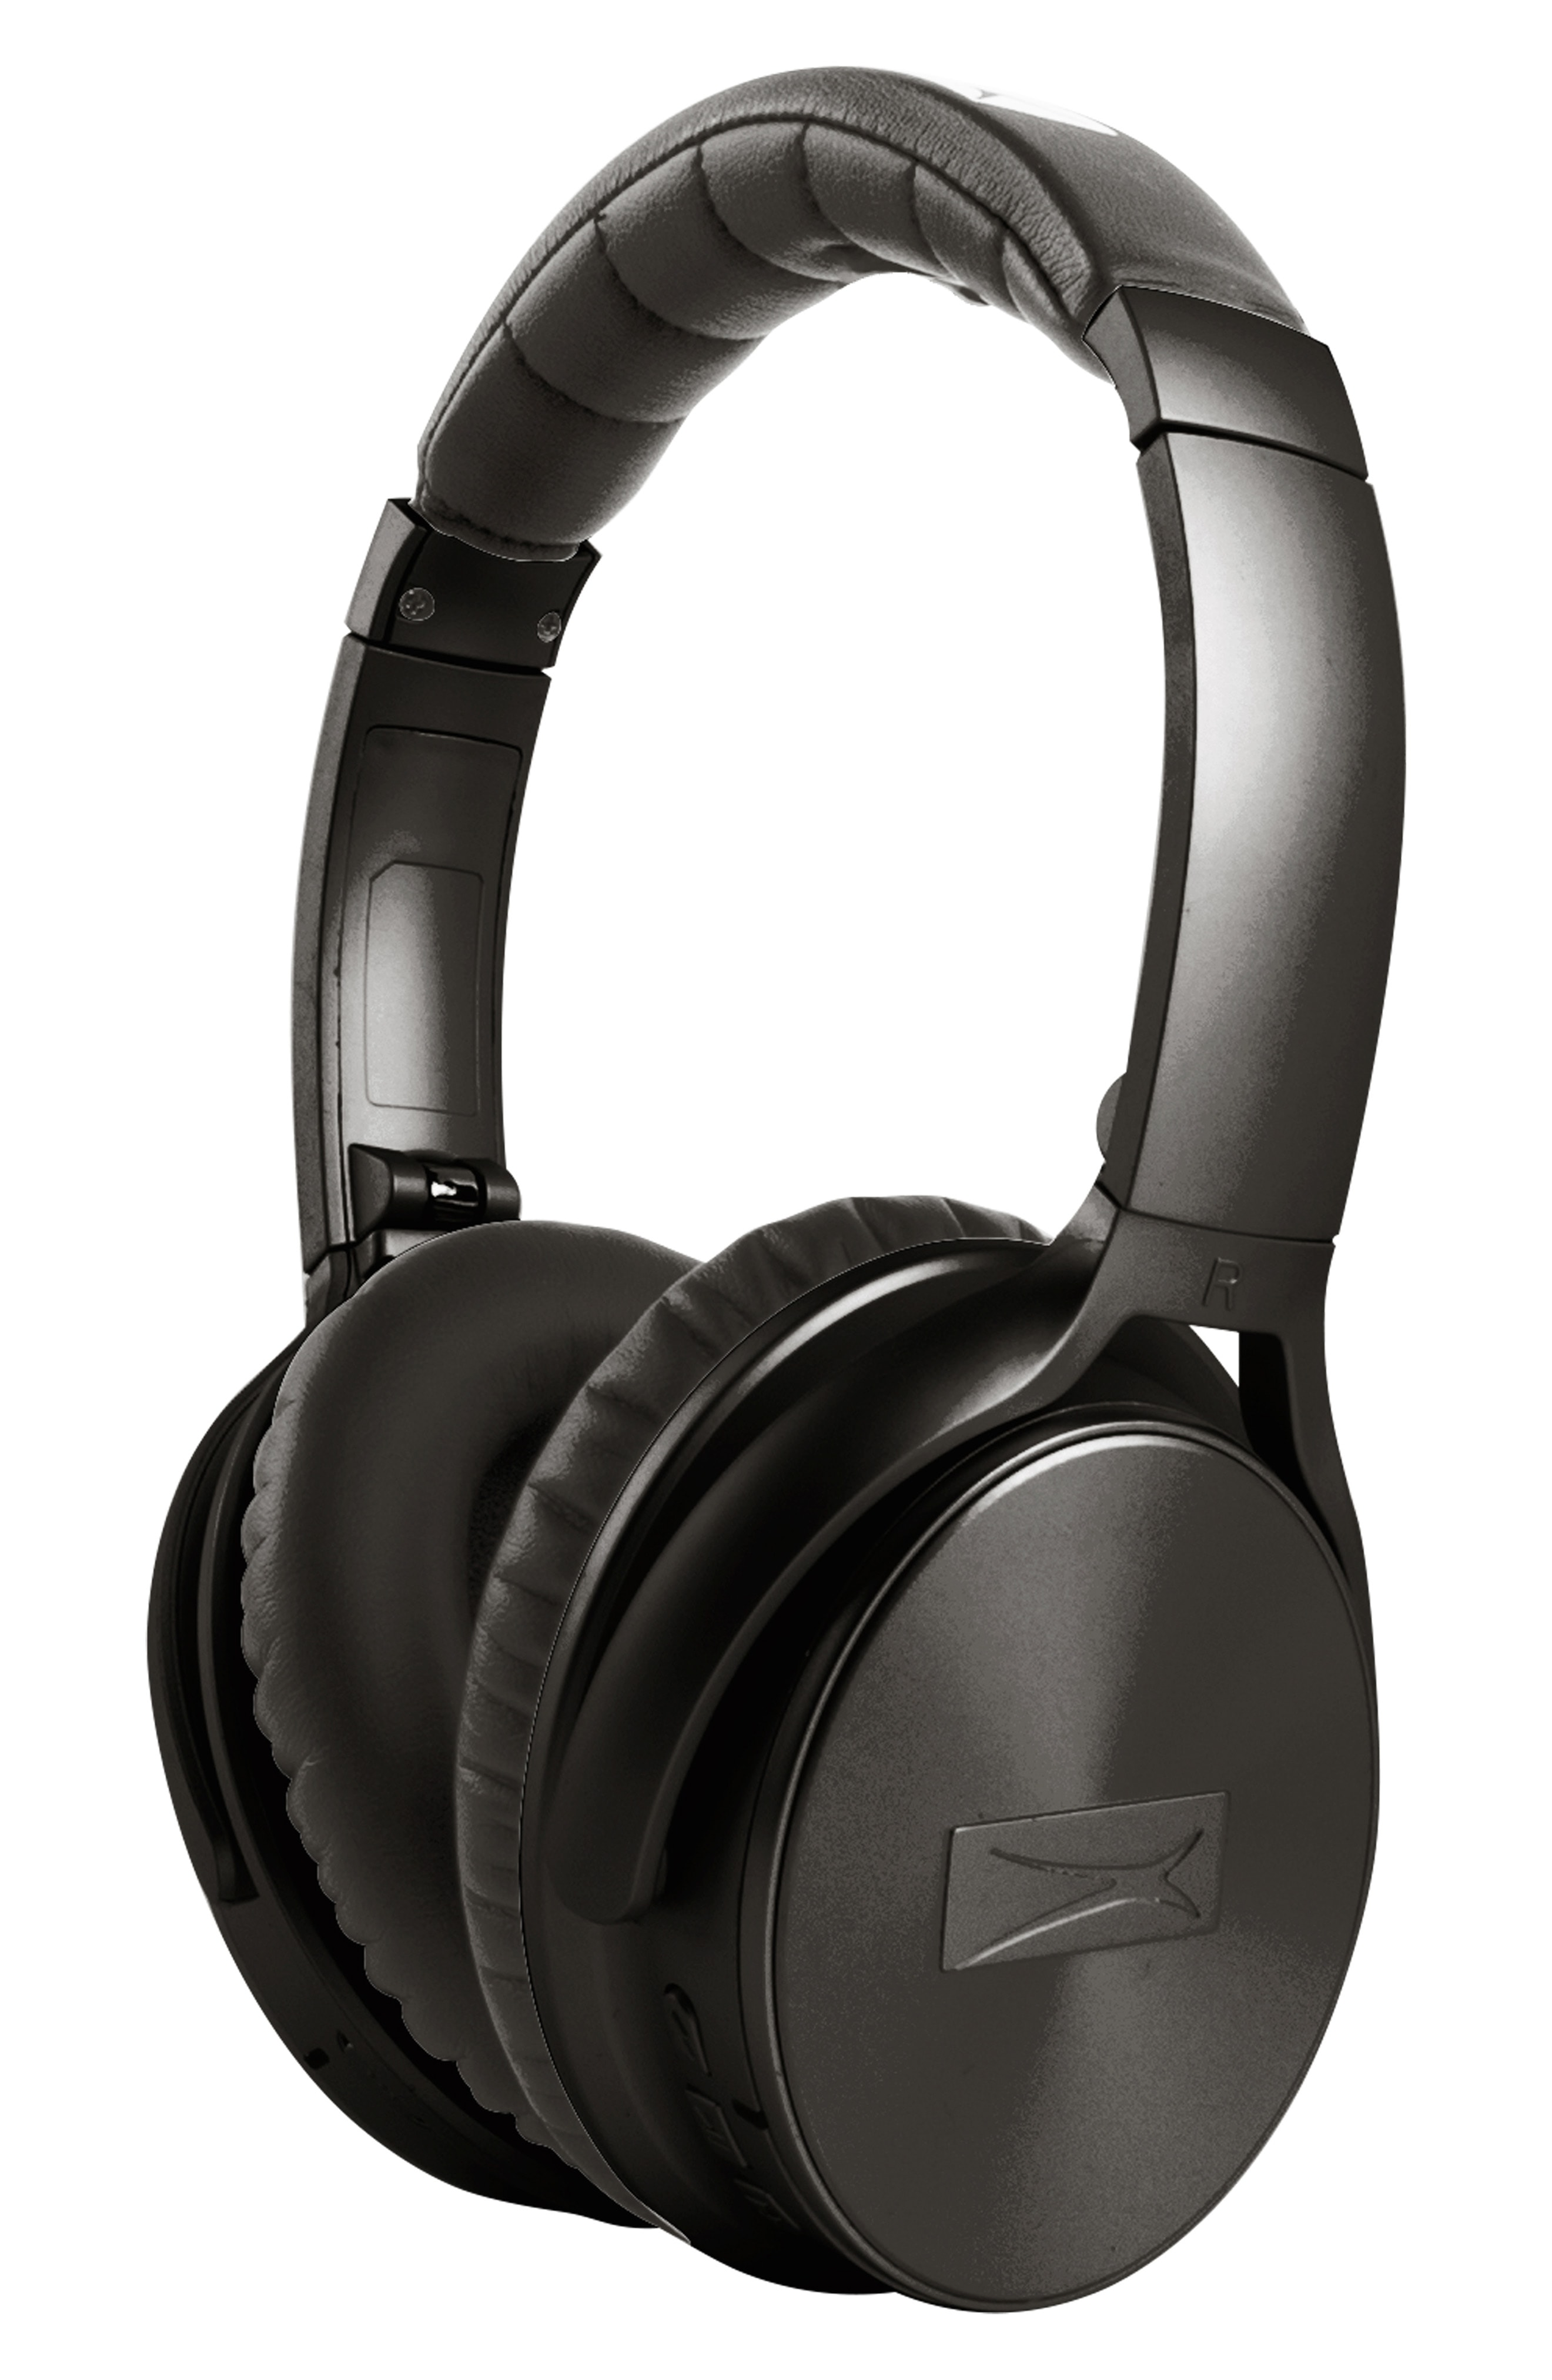 Altec Lansing Active Noise Cancelling Wireless Headphones